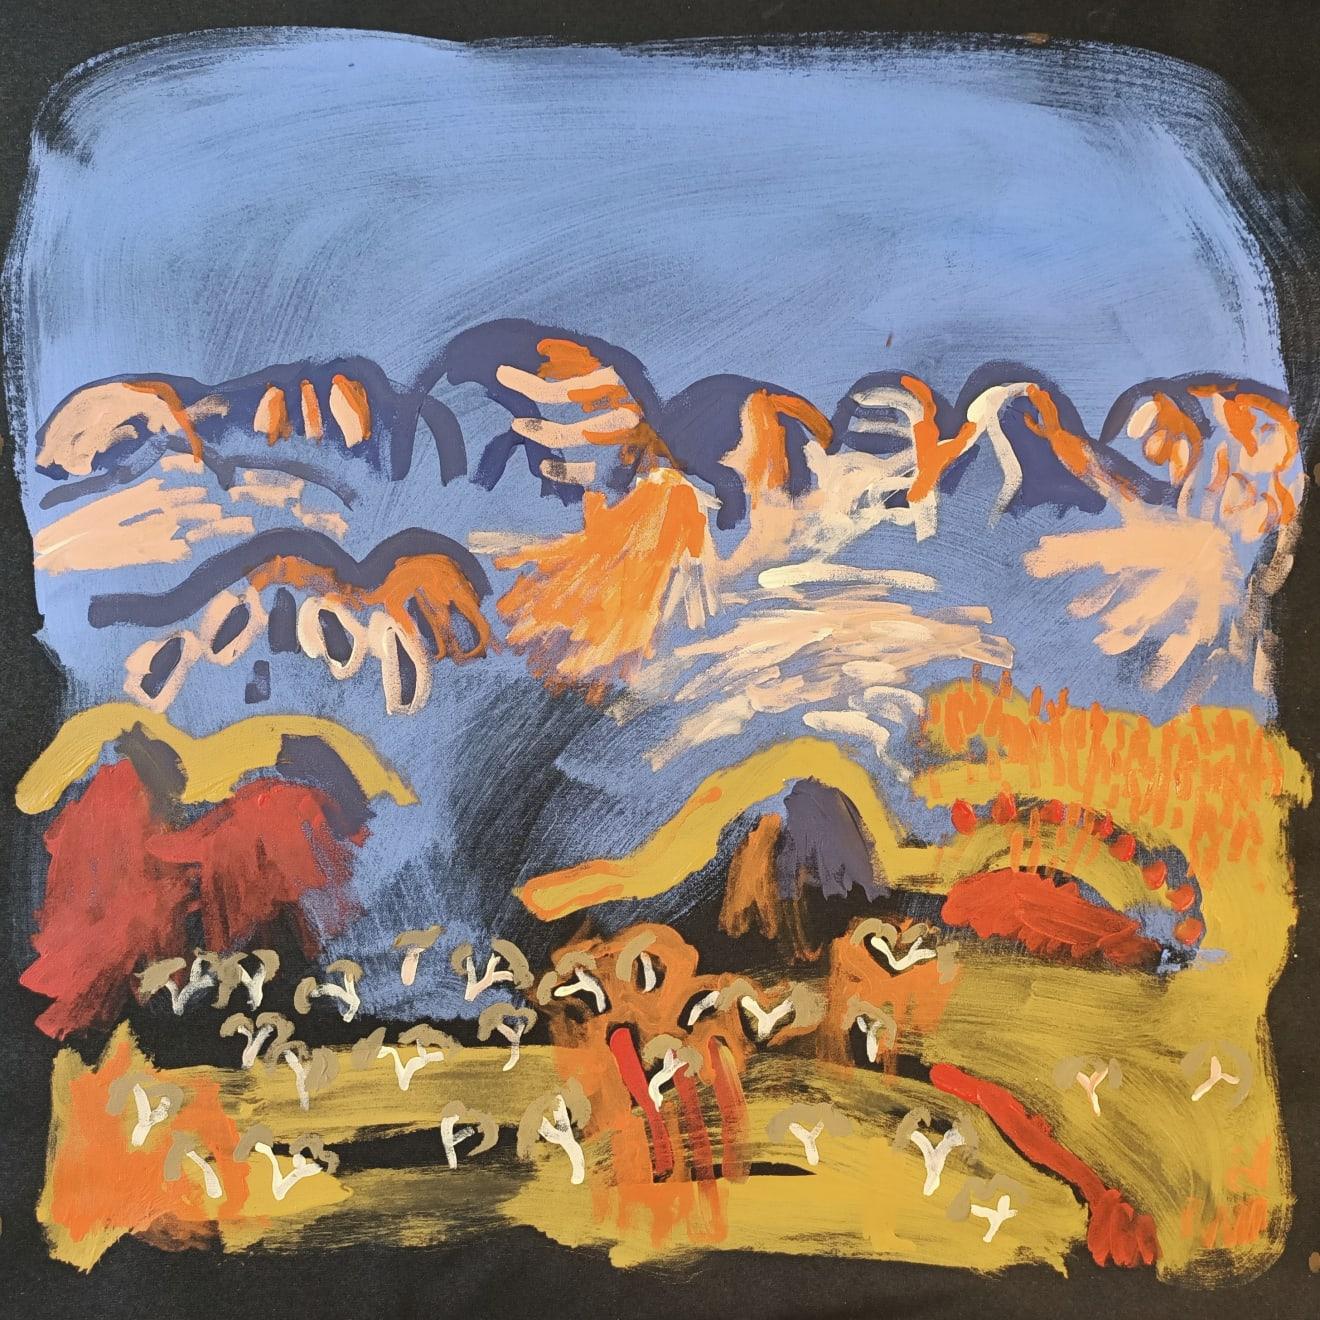 Zak Tilley Blue Bluffs at Papunya Acrylic on Canvas Original 60 x 60 cm $800 £400 SOLD